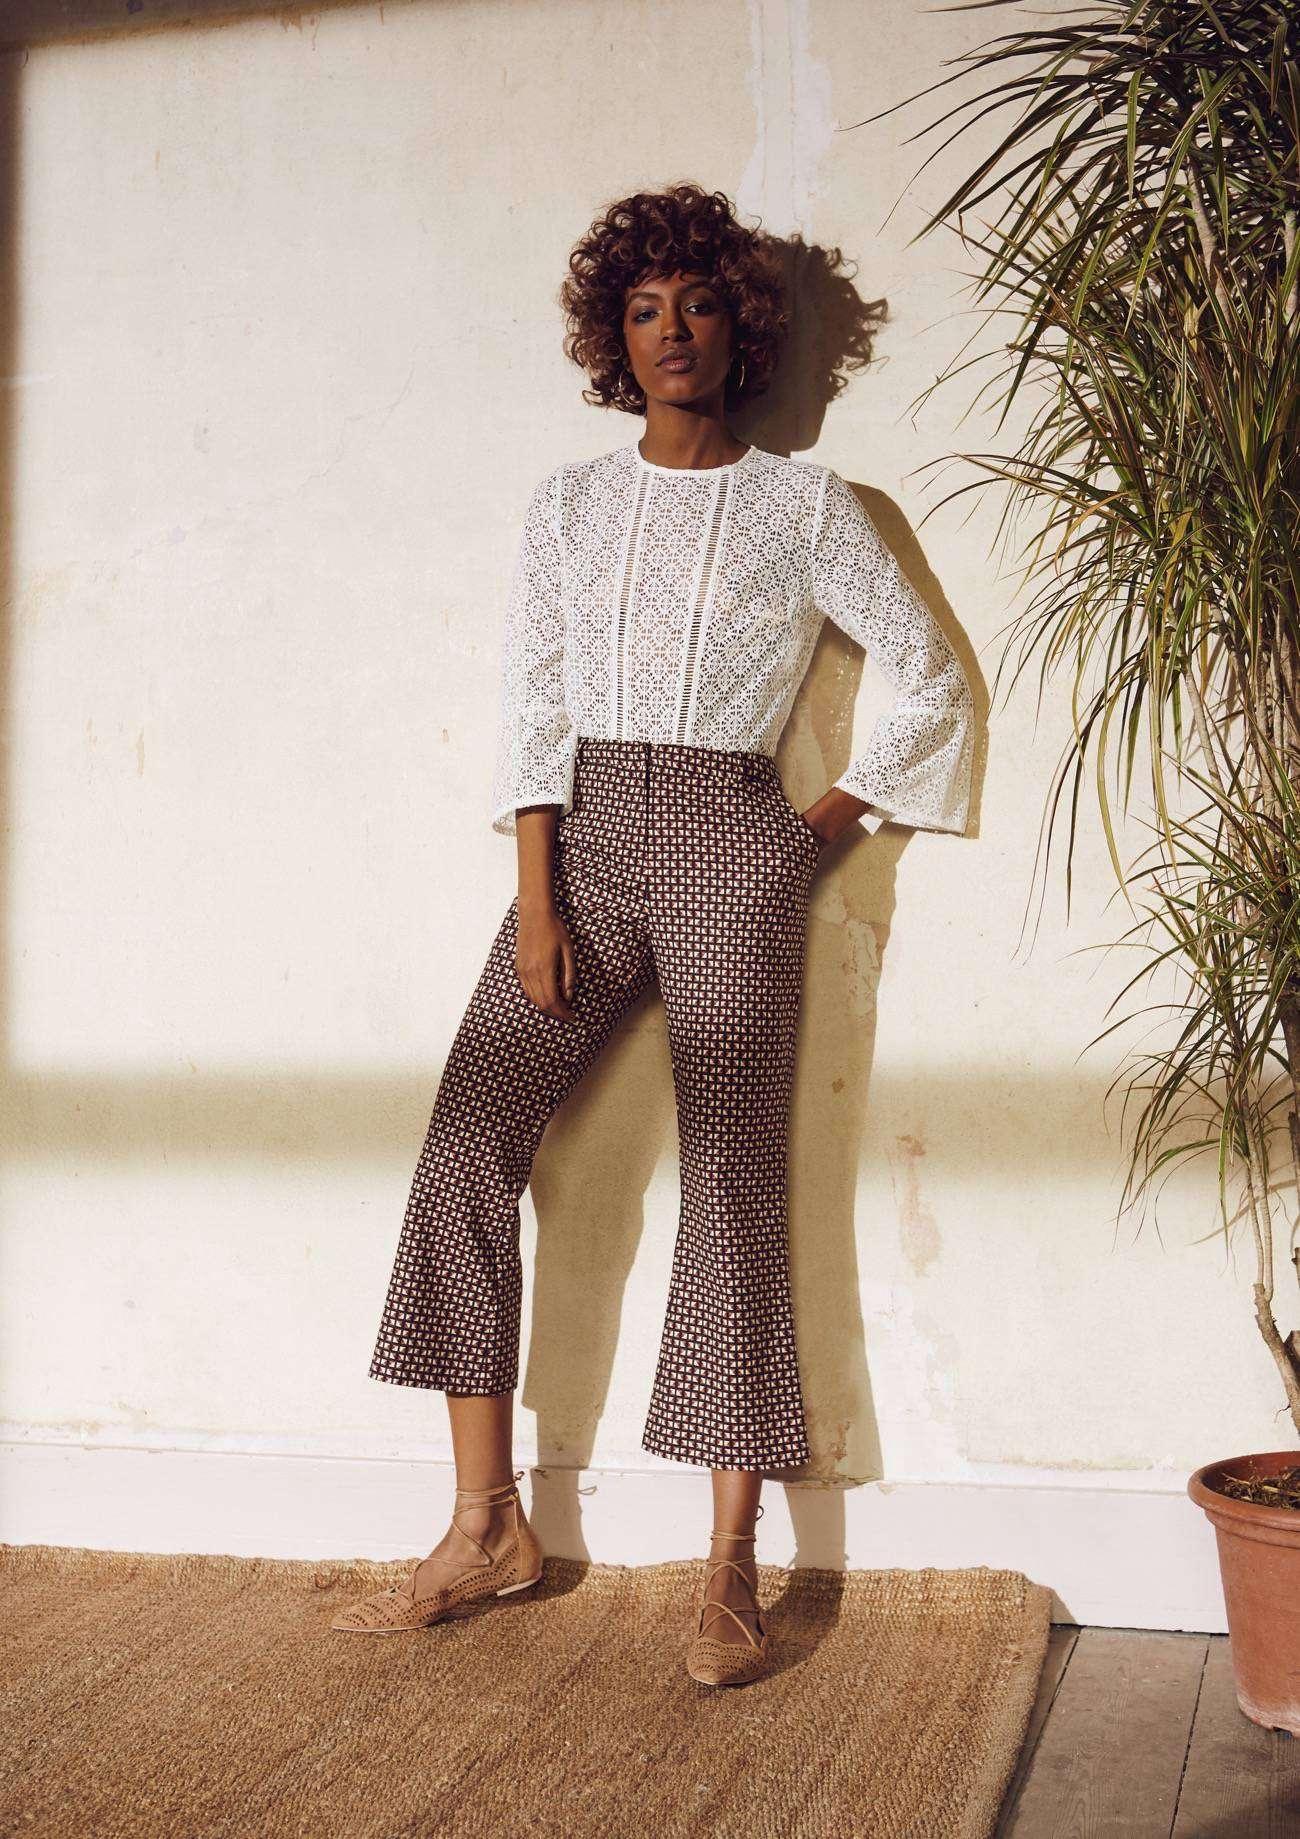 Catalogo Primark primavera - verano 2016 - camisa y pantalon